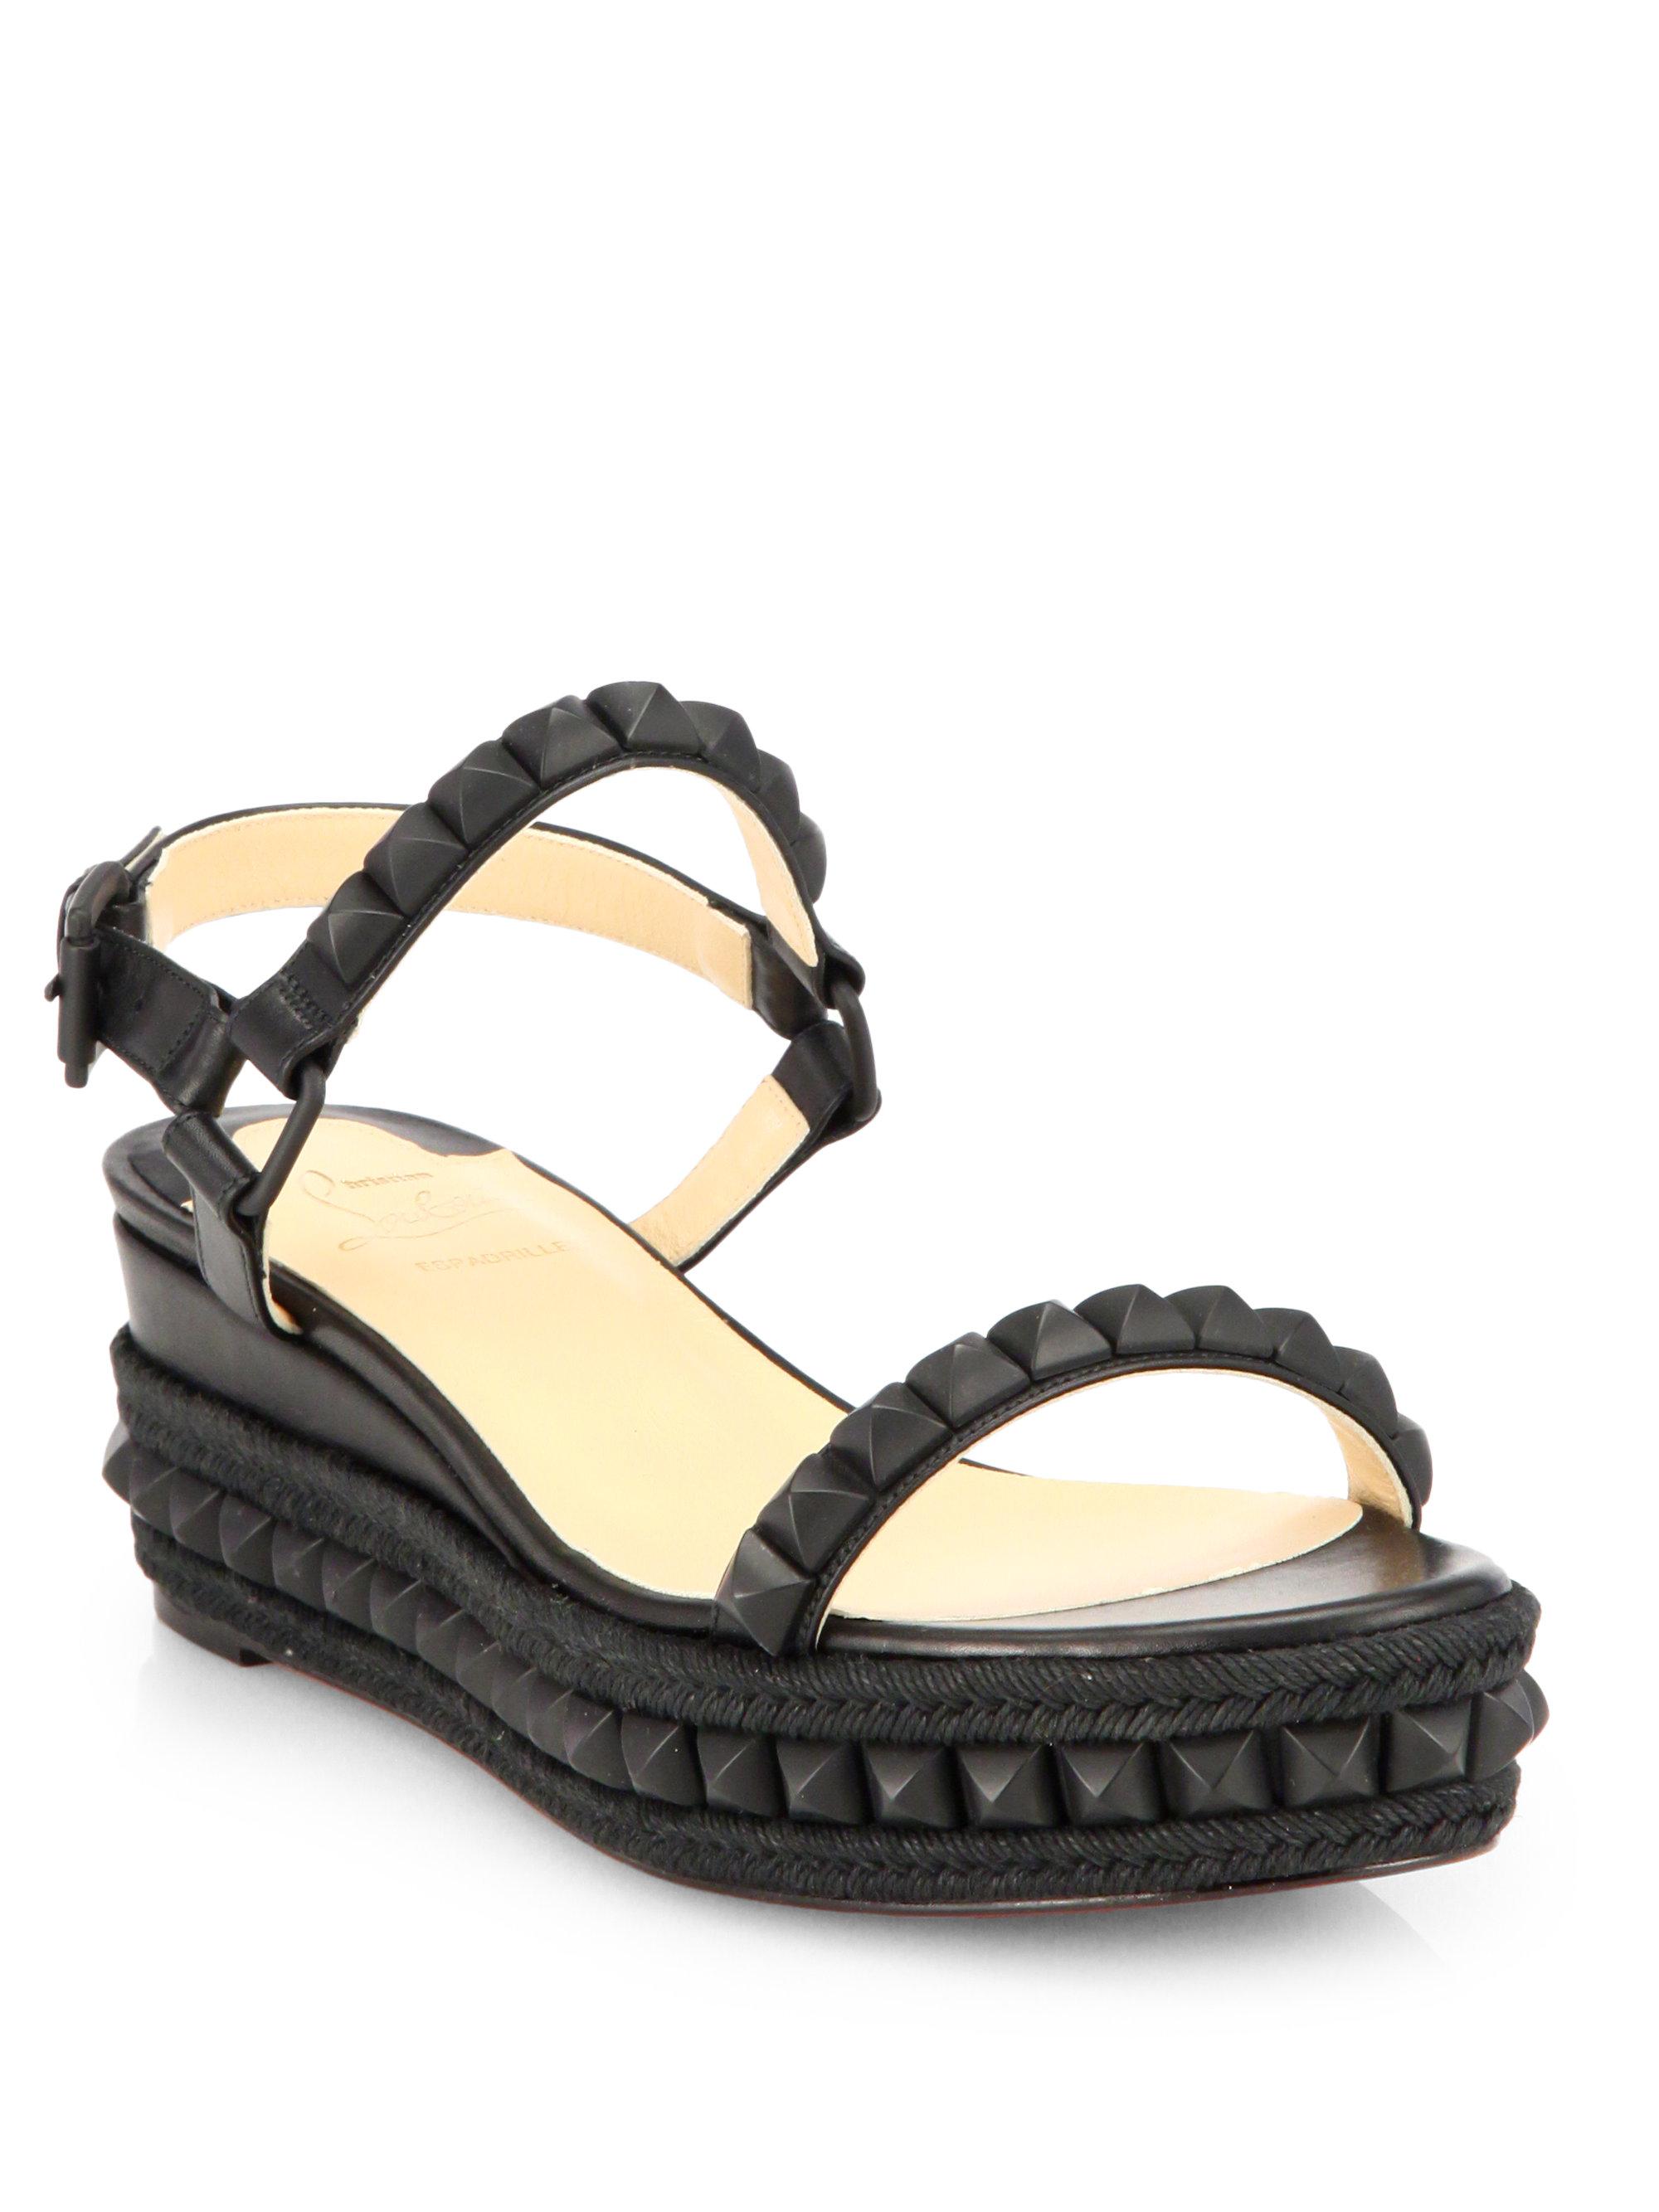 fd4886a6c5c Christian Louboutin Black Cataclou Studded Wedge Sandals